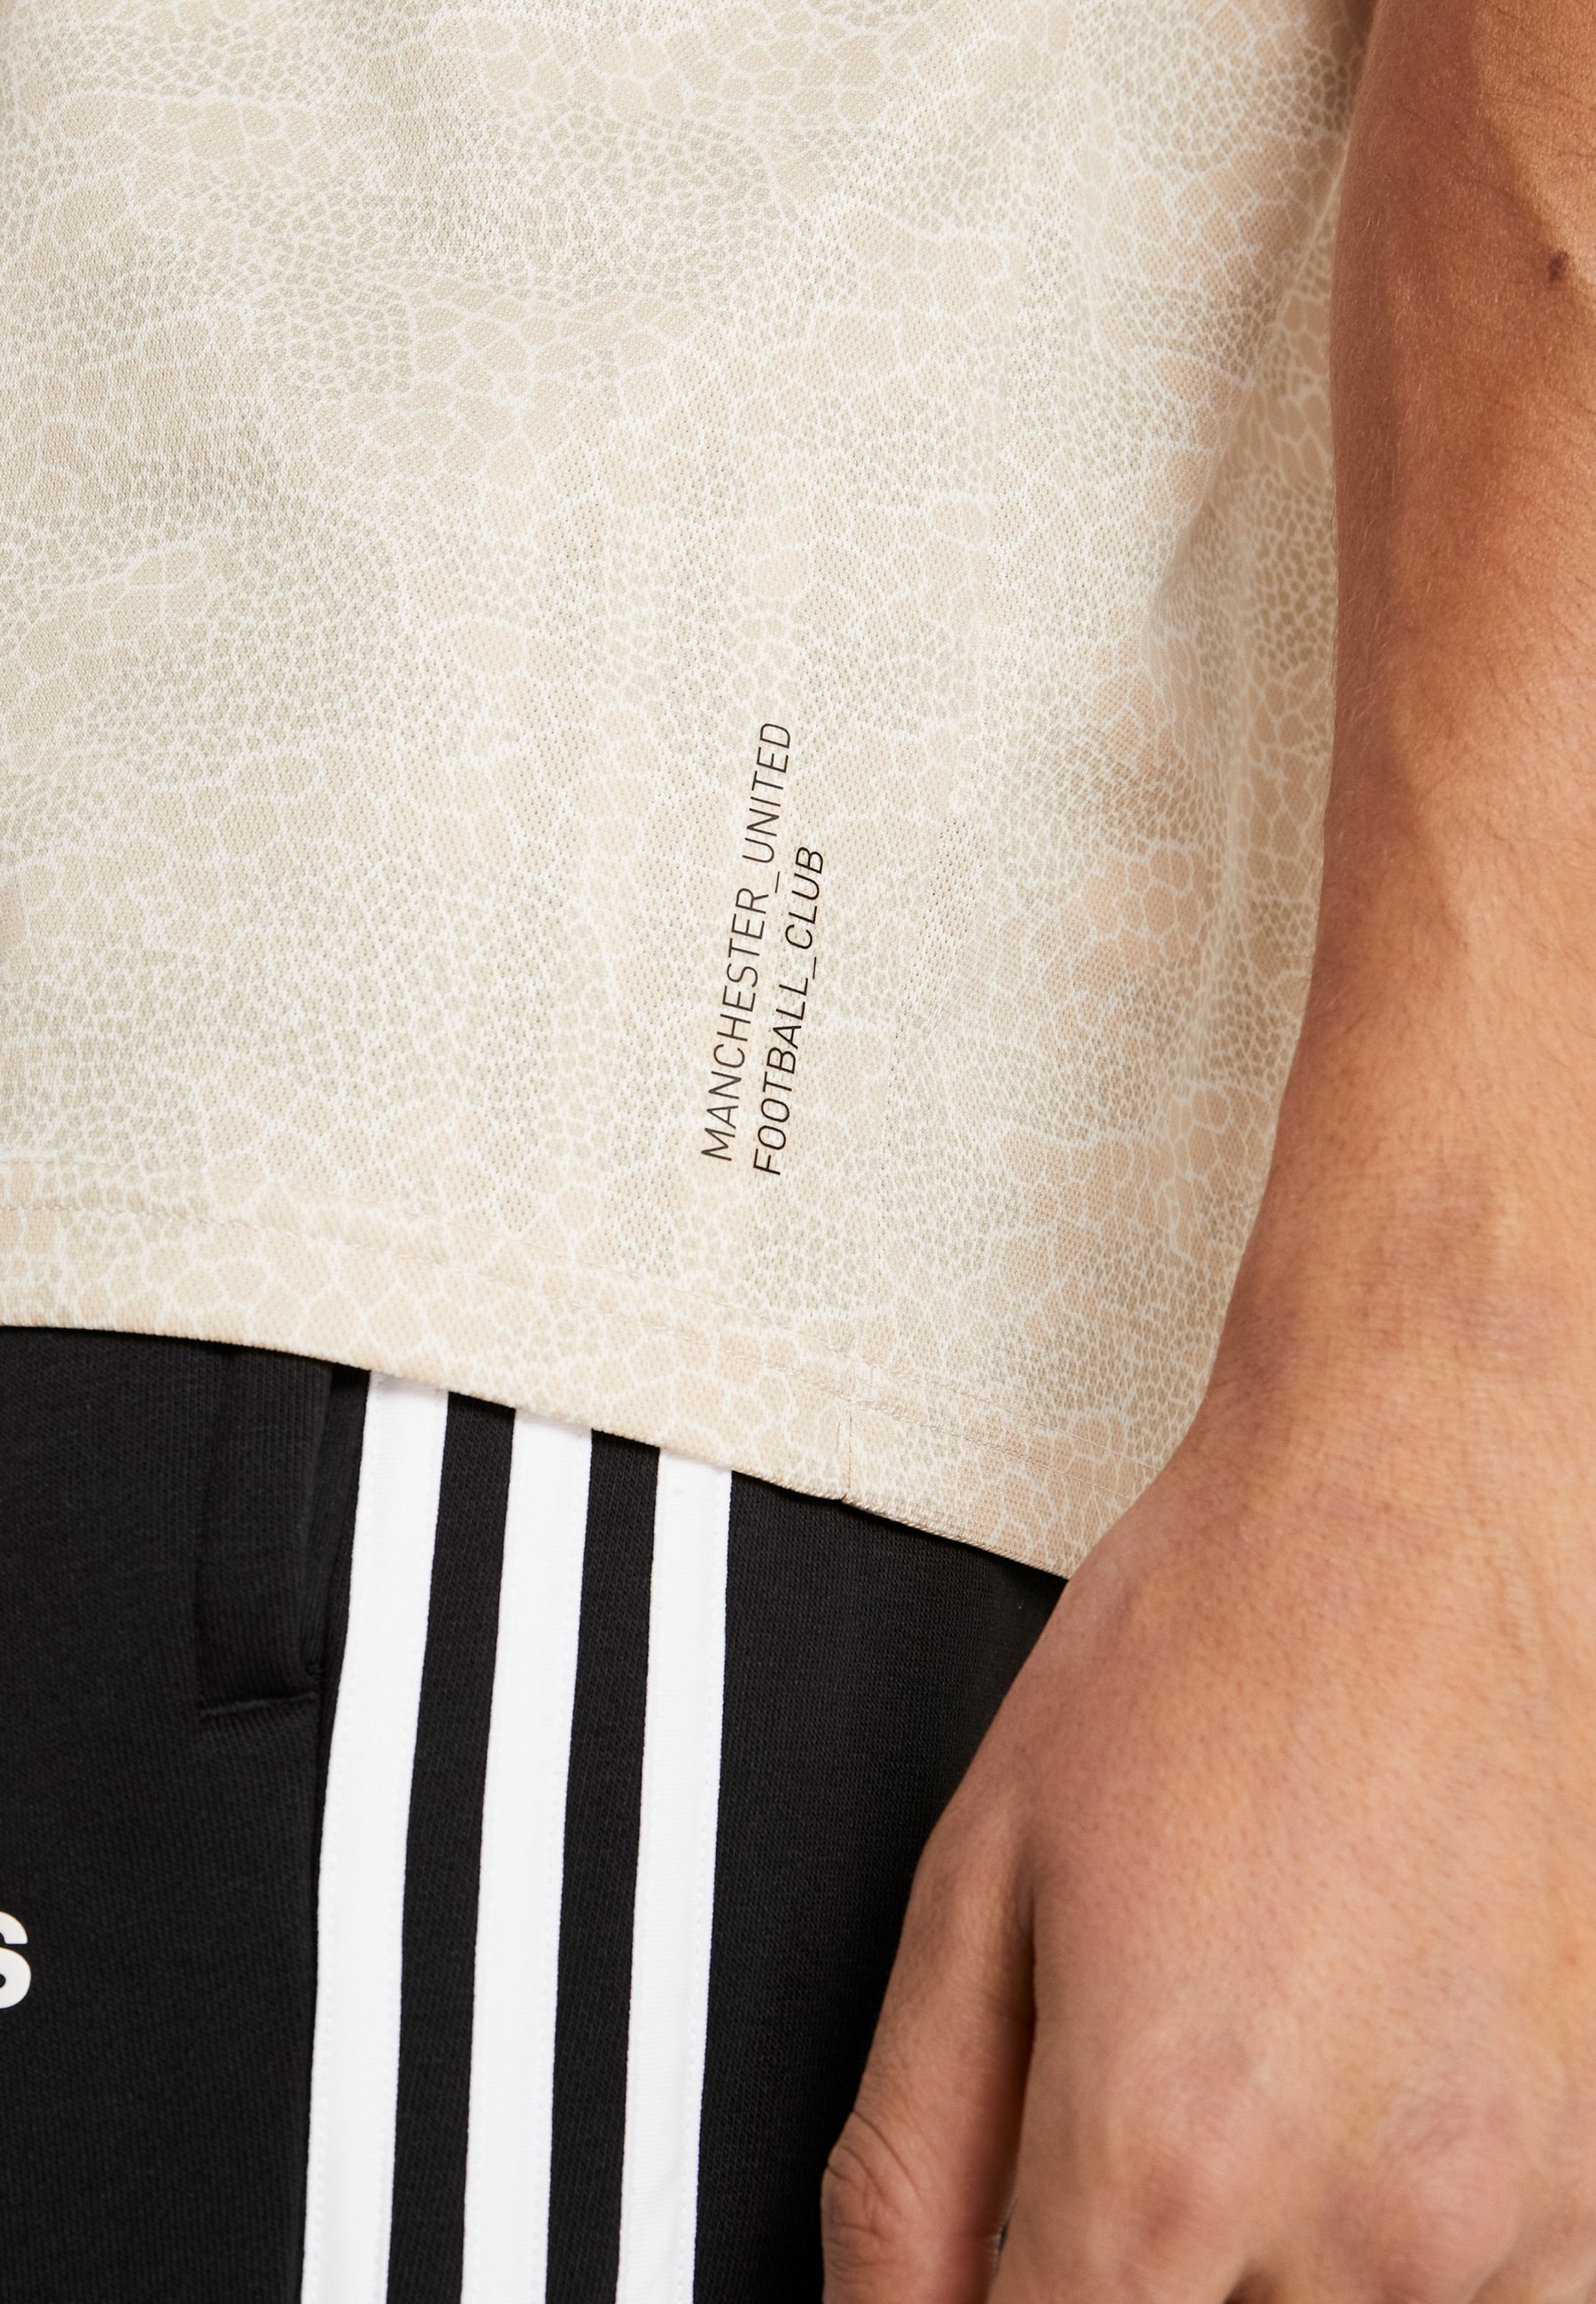 Adidas Performance Mufc A - Klubbkläder Tan